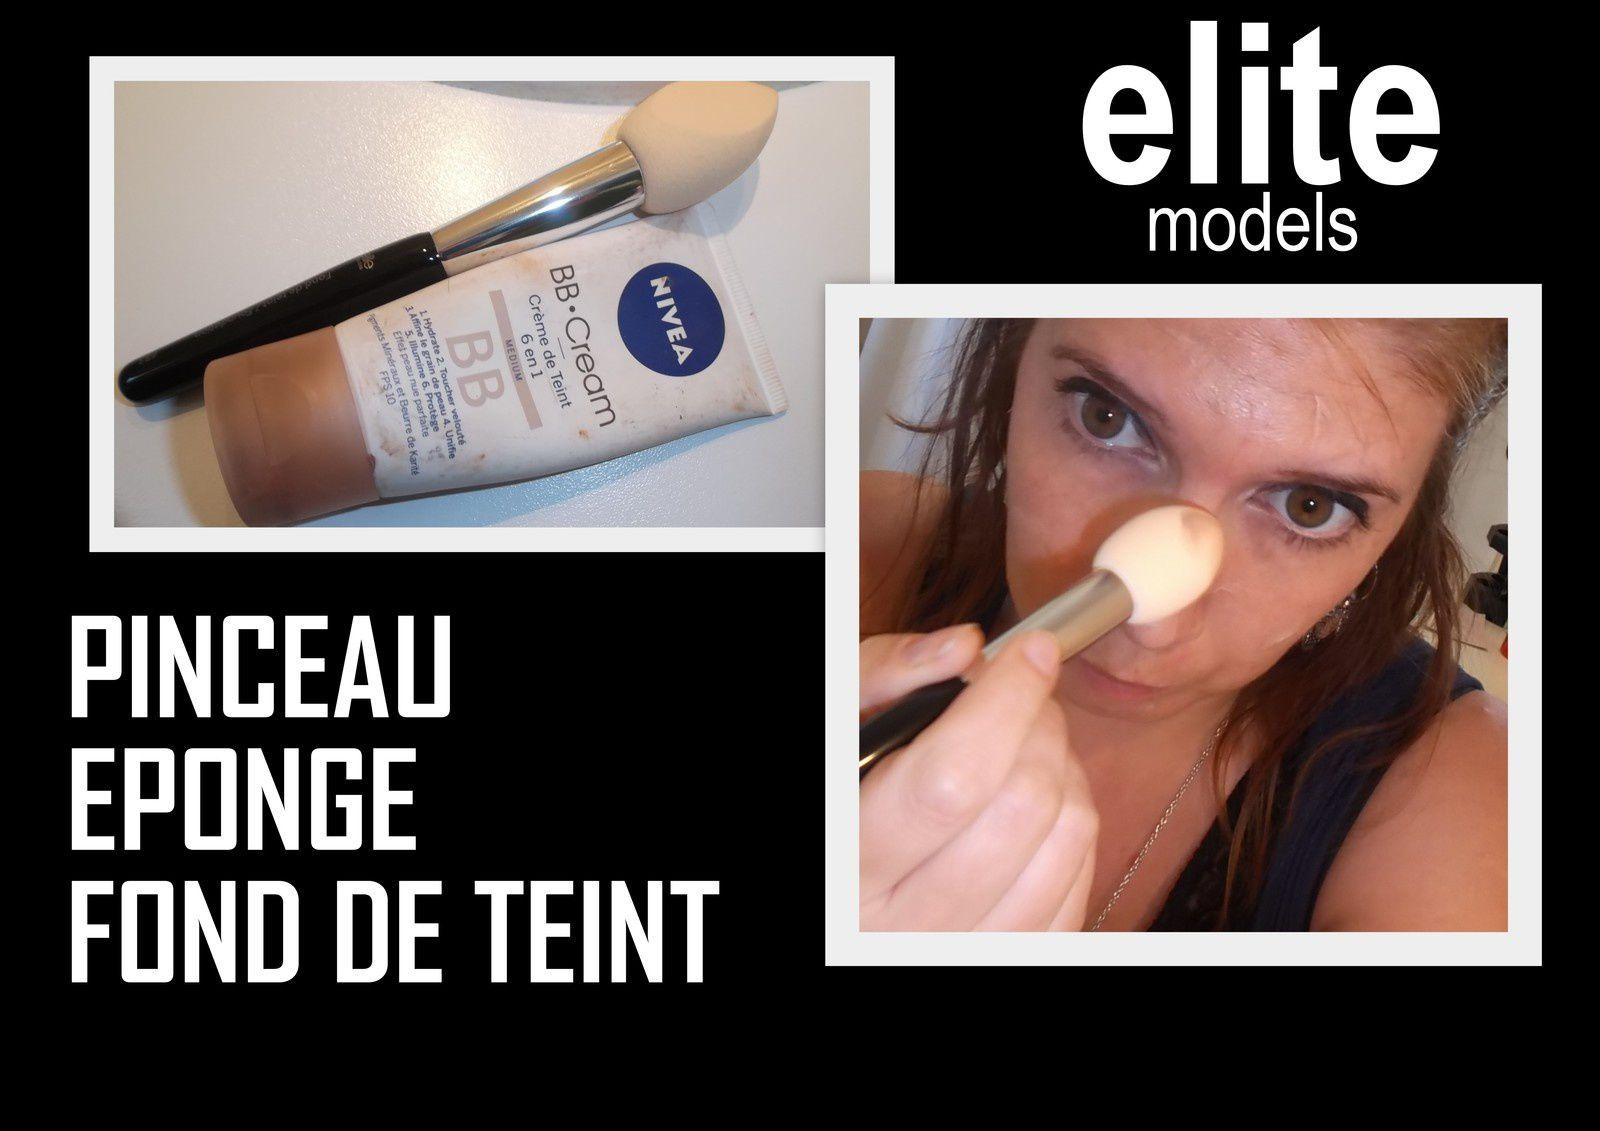 [RESULTAT] 3 pinceaux maquillage Elite Models #test #concours